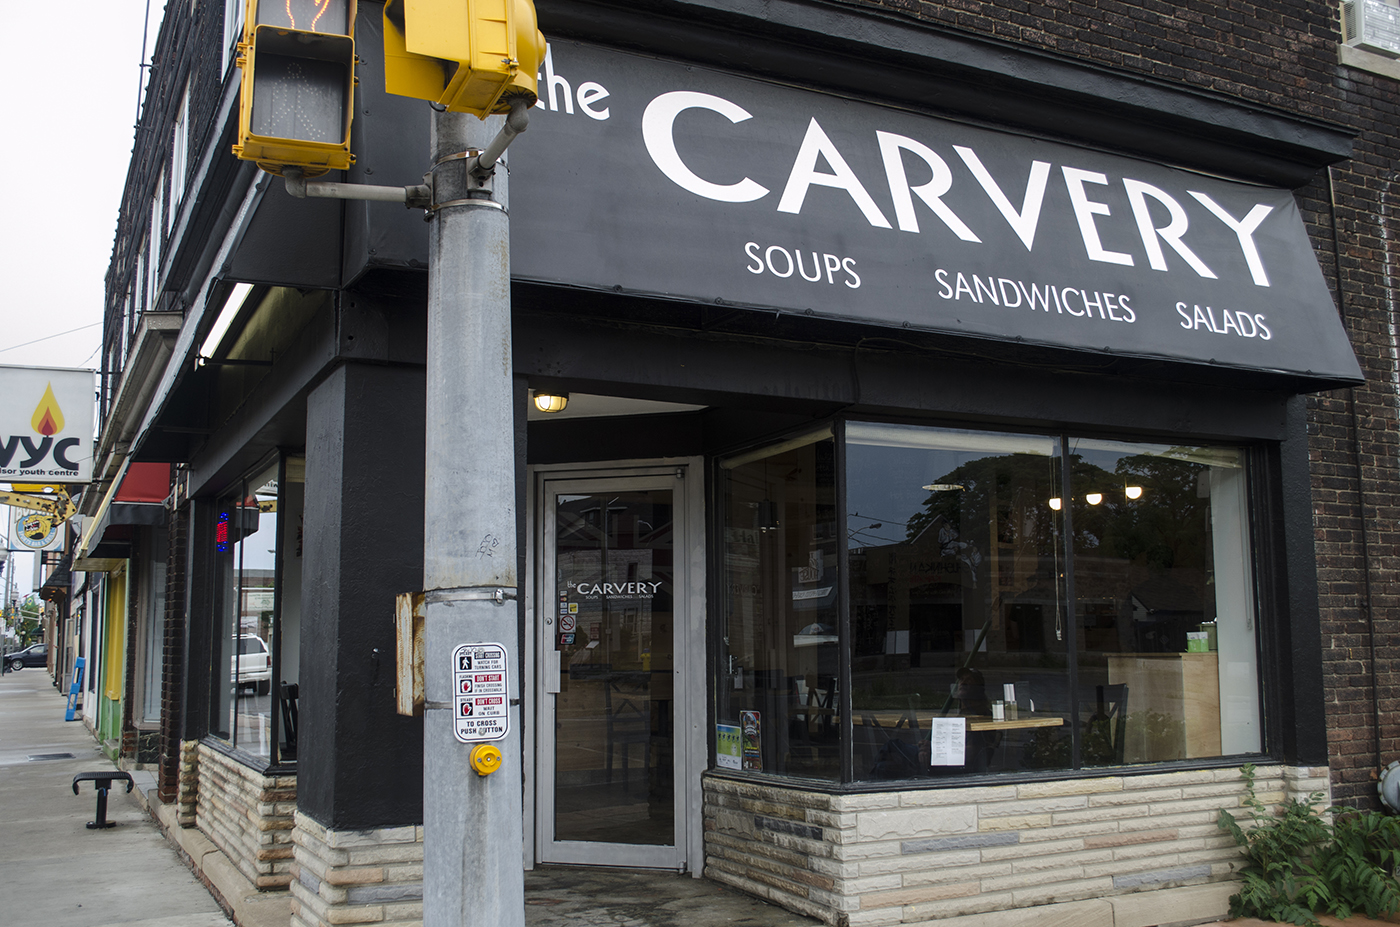 The Carvery - WindsorEats